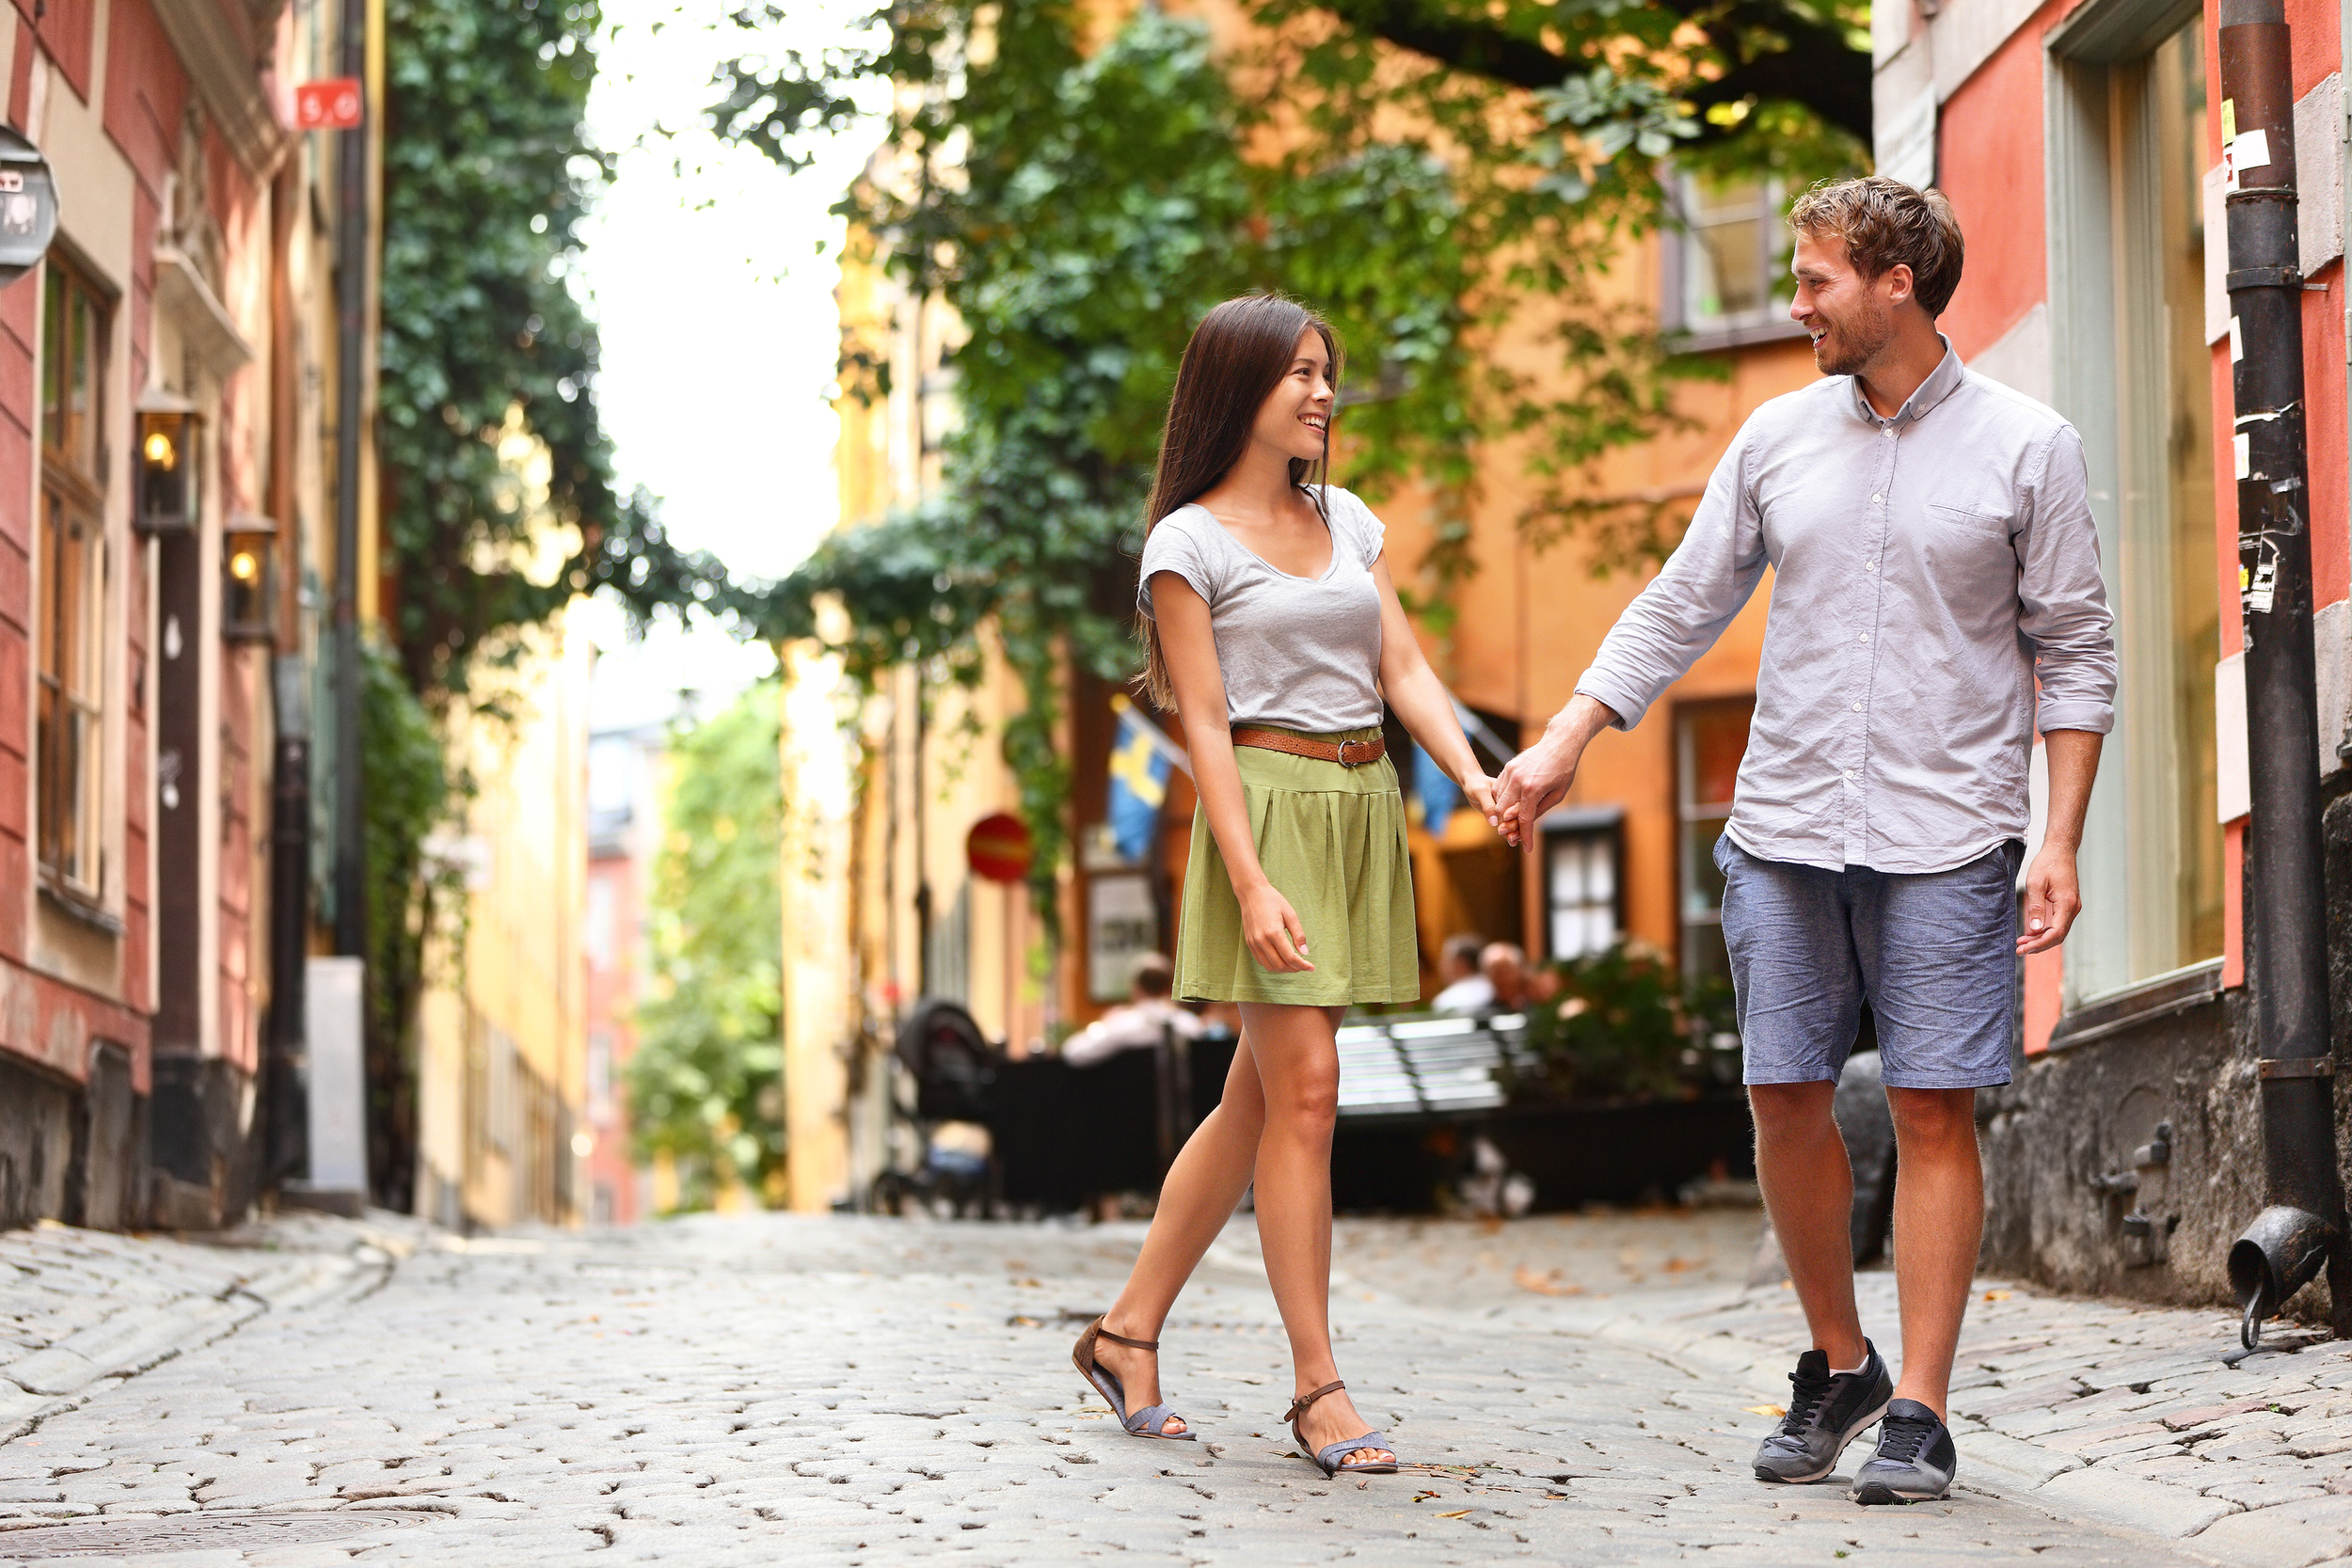 bigstock-Happy-couple-in-love-walking-i-82549178.jpg